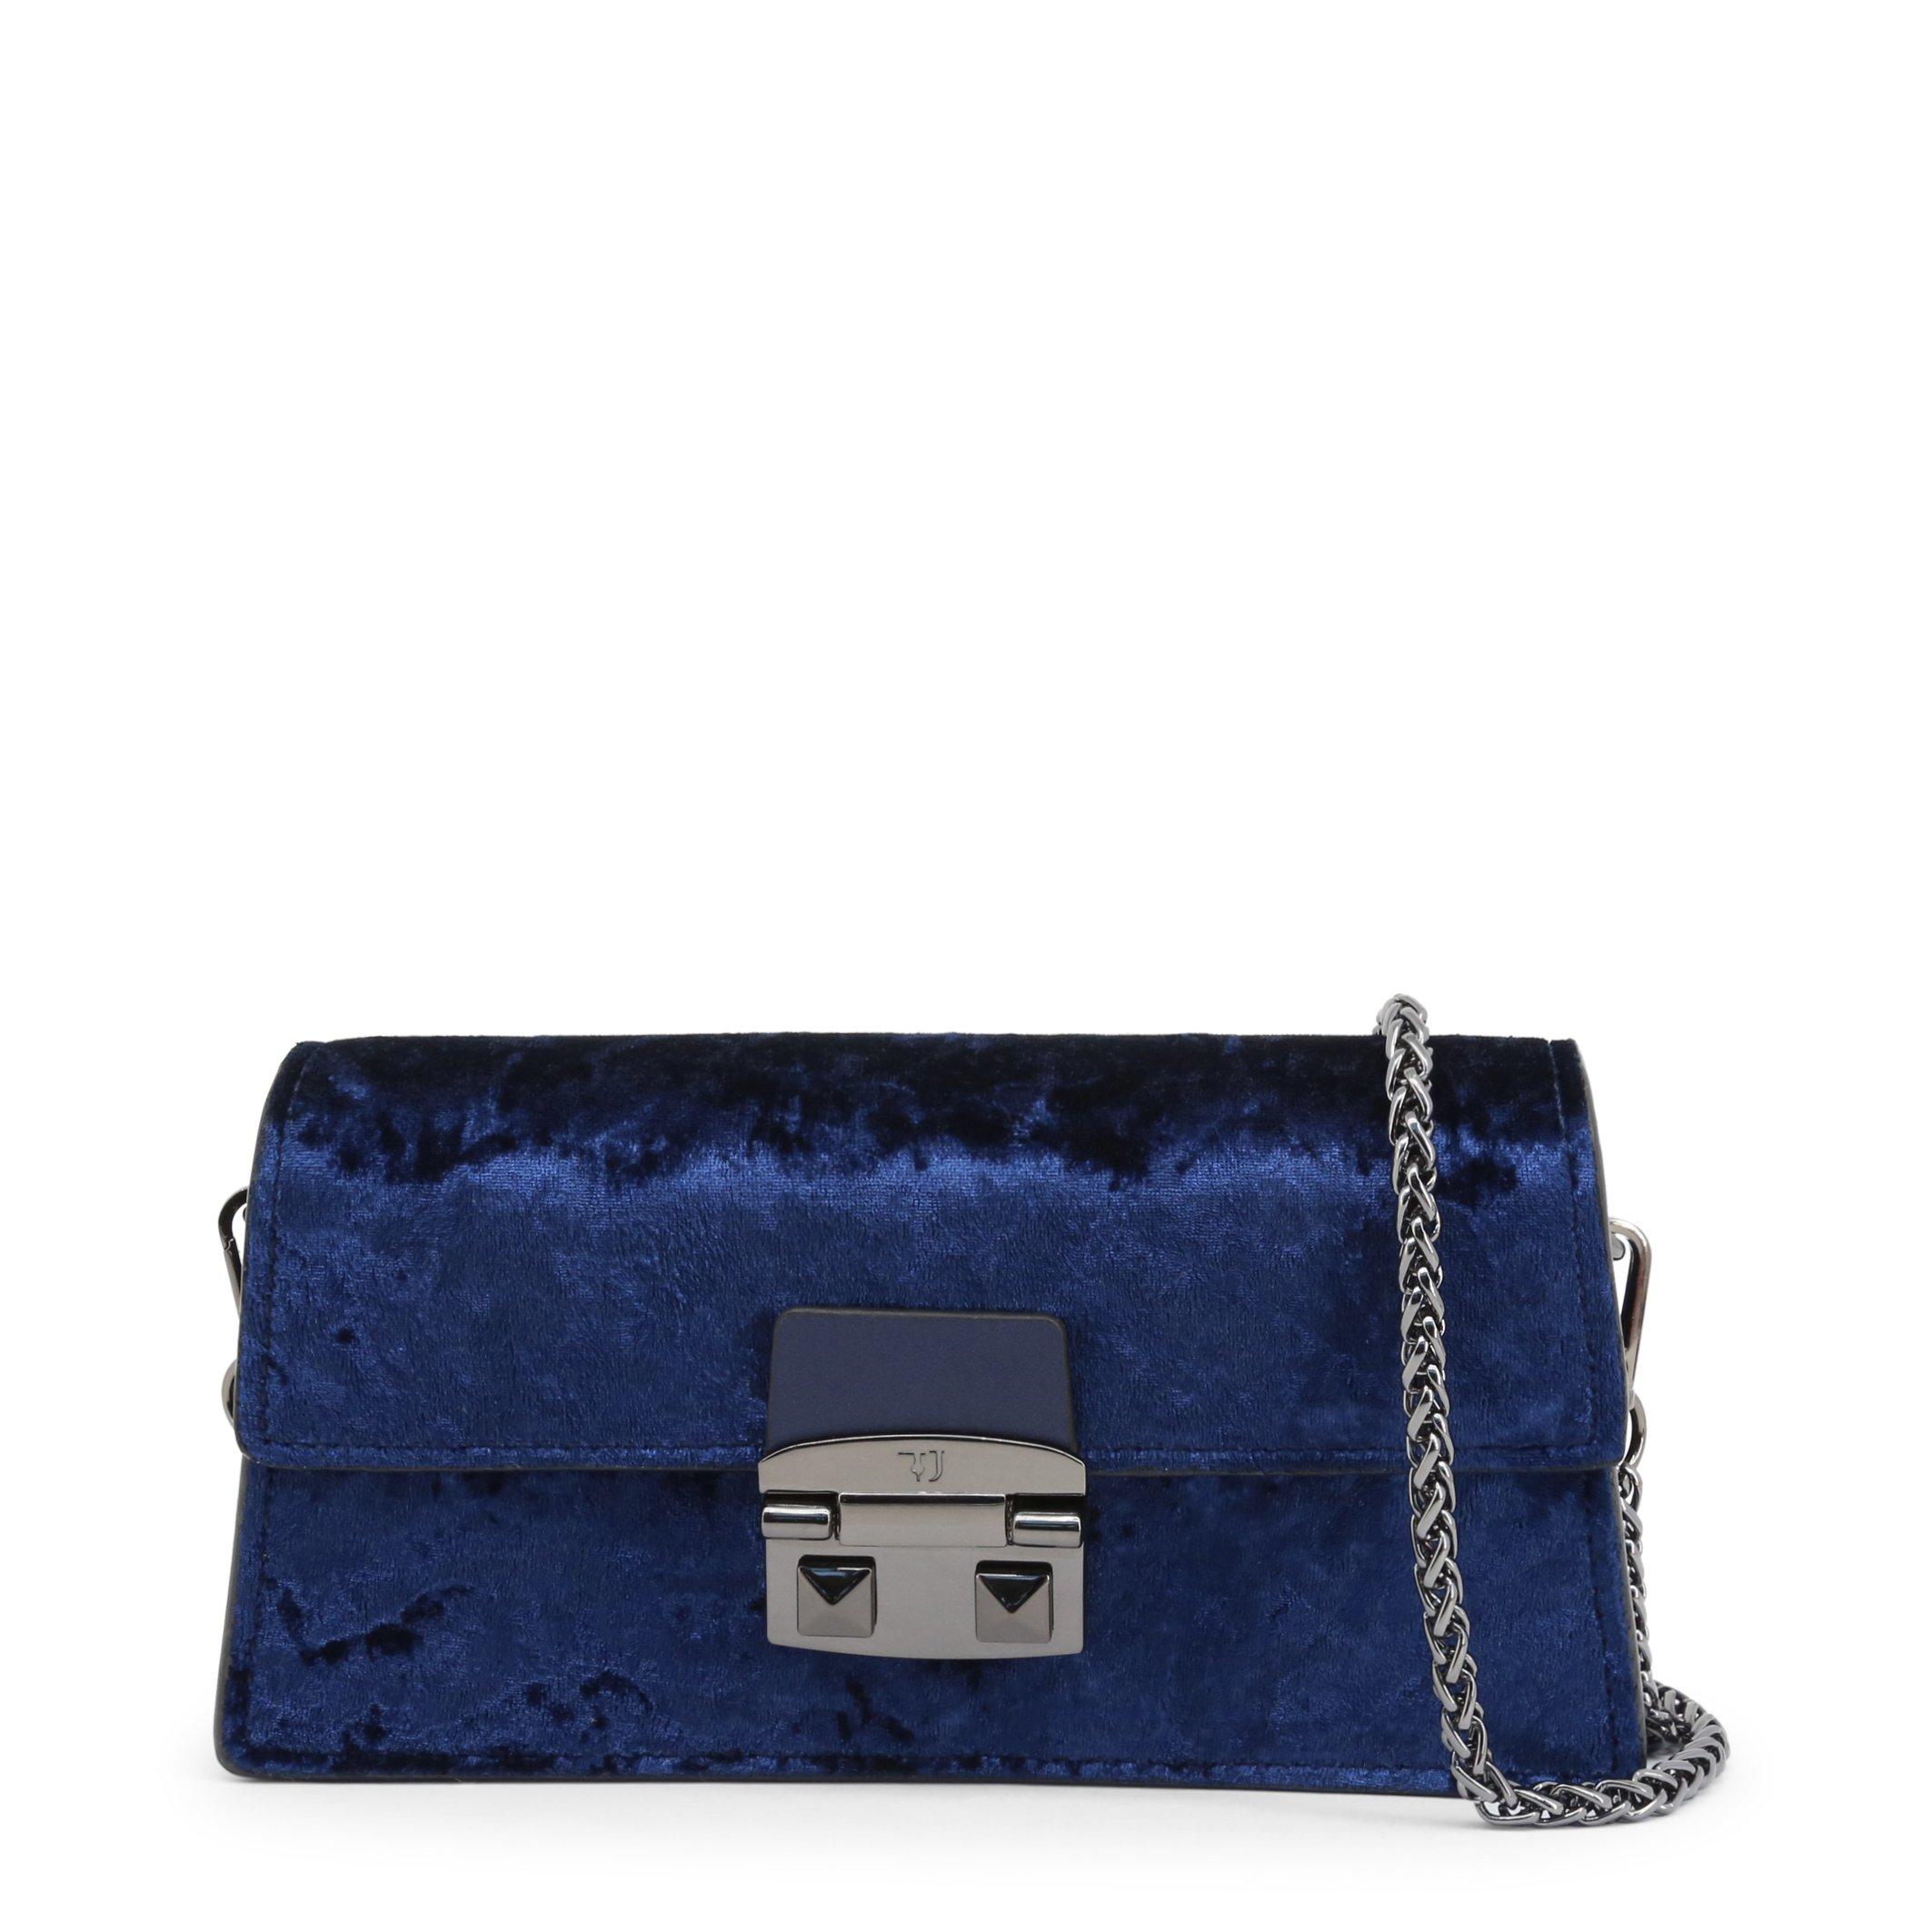 Trussardi Women's Clutch Bag Various Colours CORIANDOLO_75B00554 - blue-1 NOSIZE